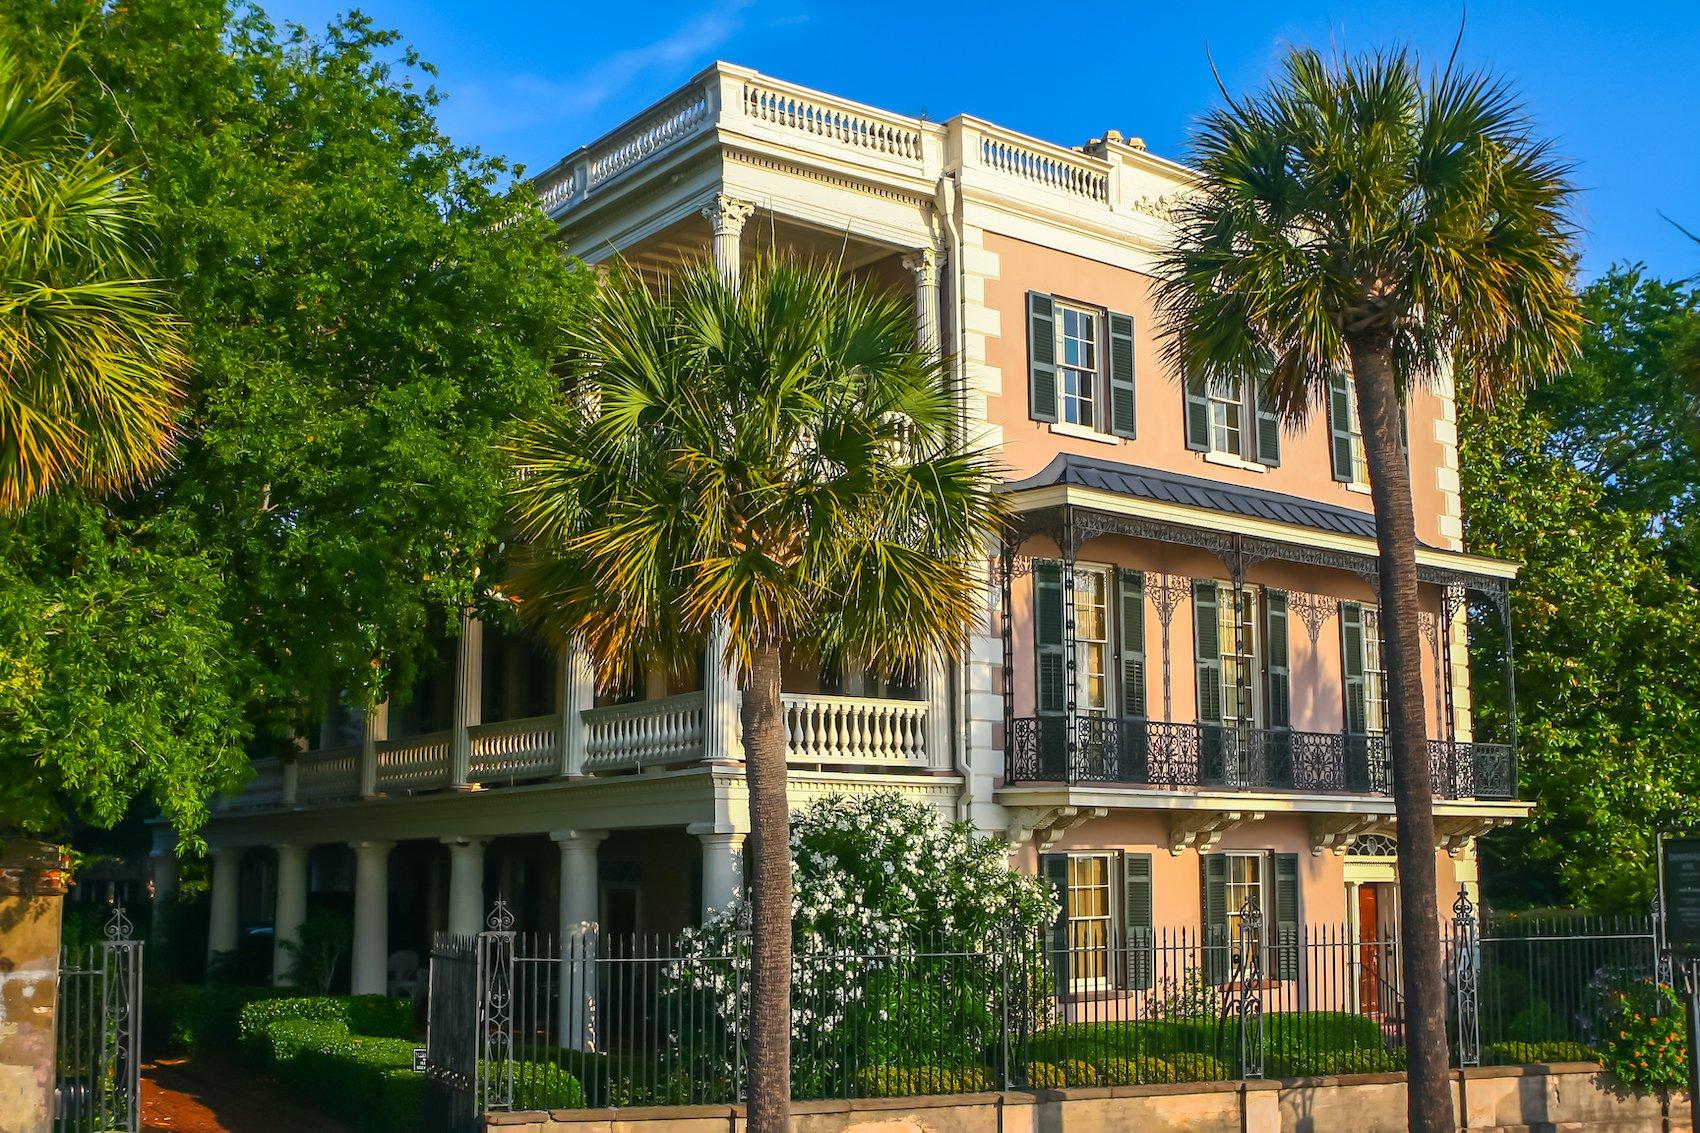 Historic-Edmonston-Alston-House-Charleston-South-Car-87770855